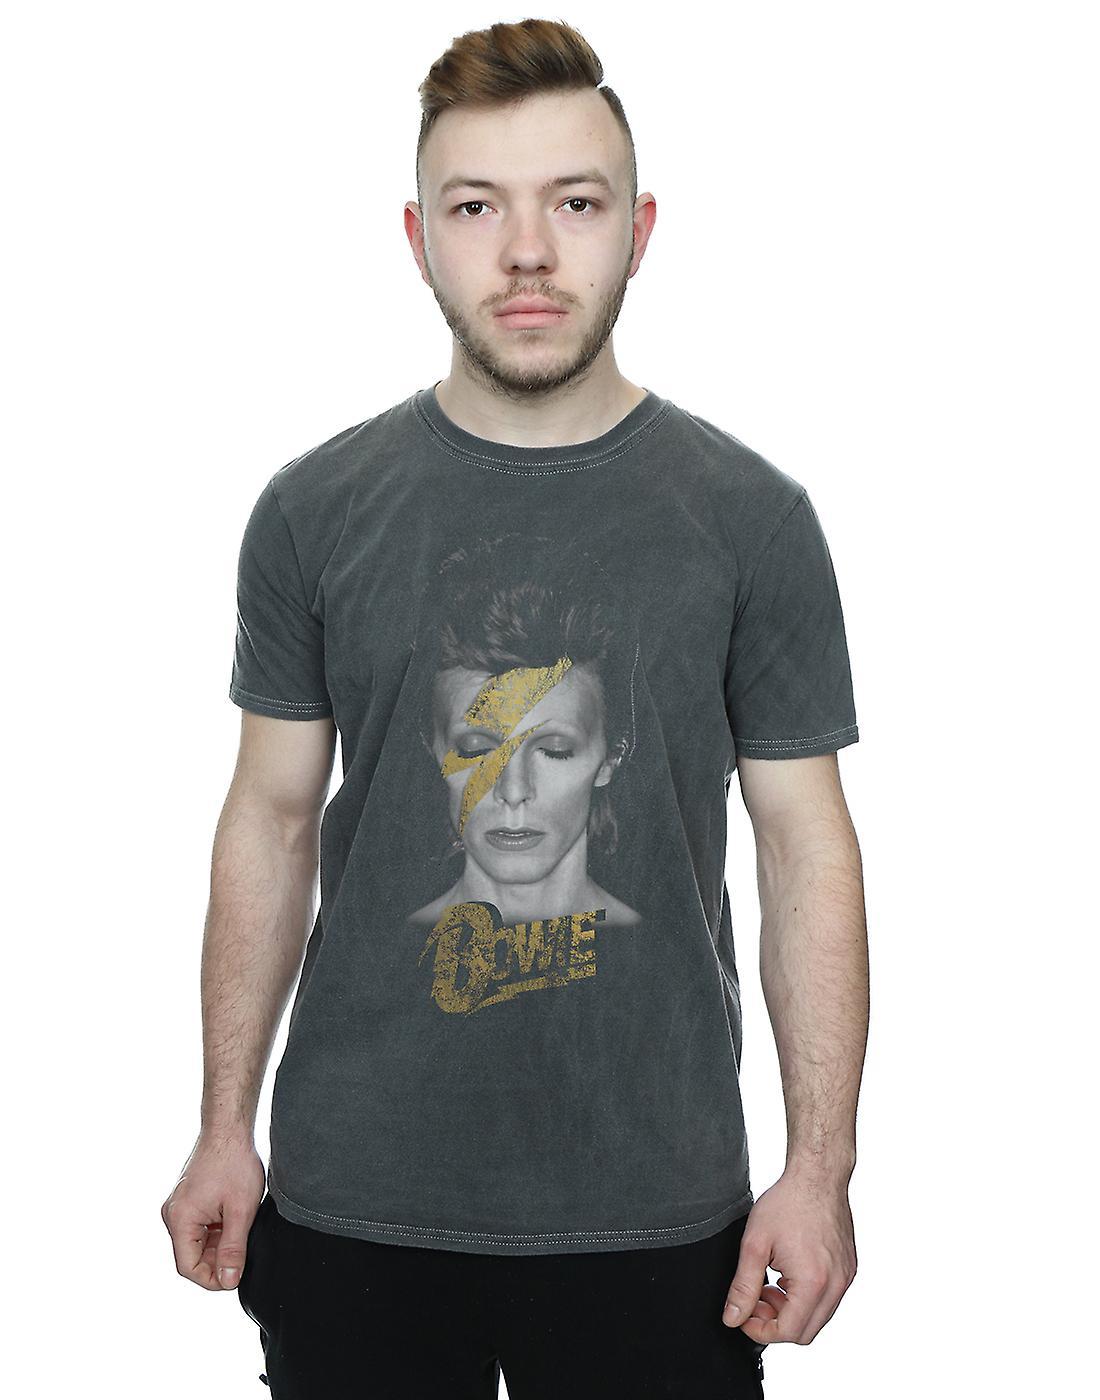 David Bowie Girls Aladdin Sane Gold Bolt T-Shirt